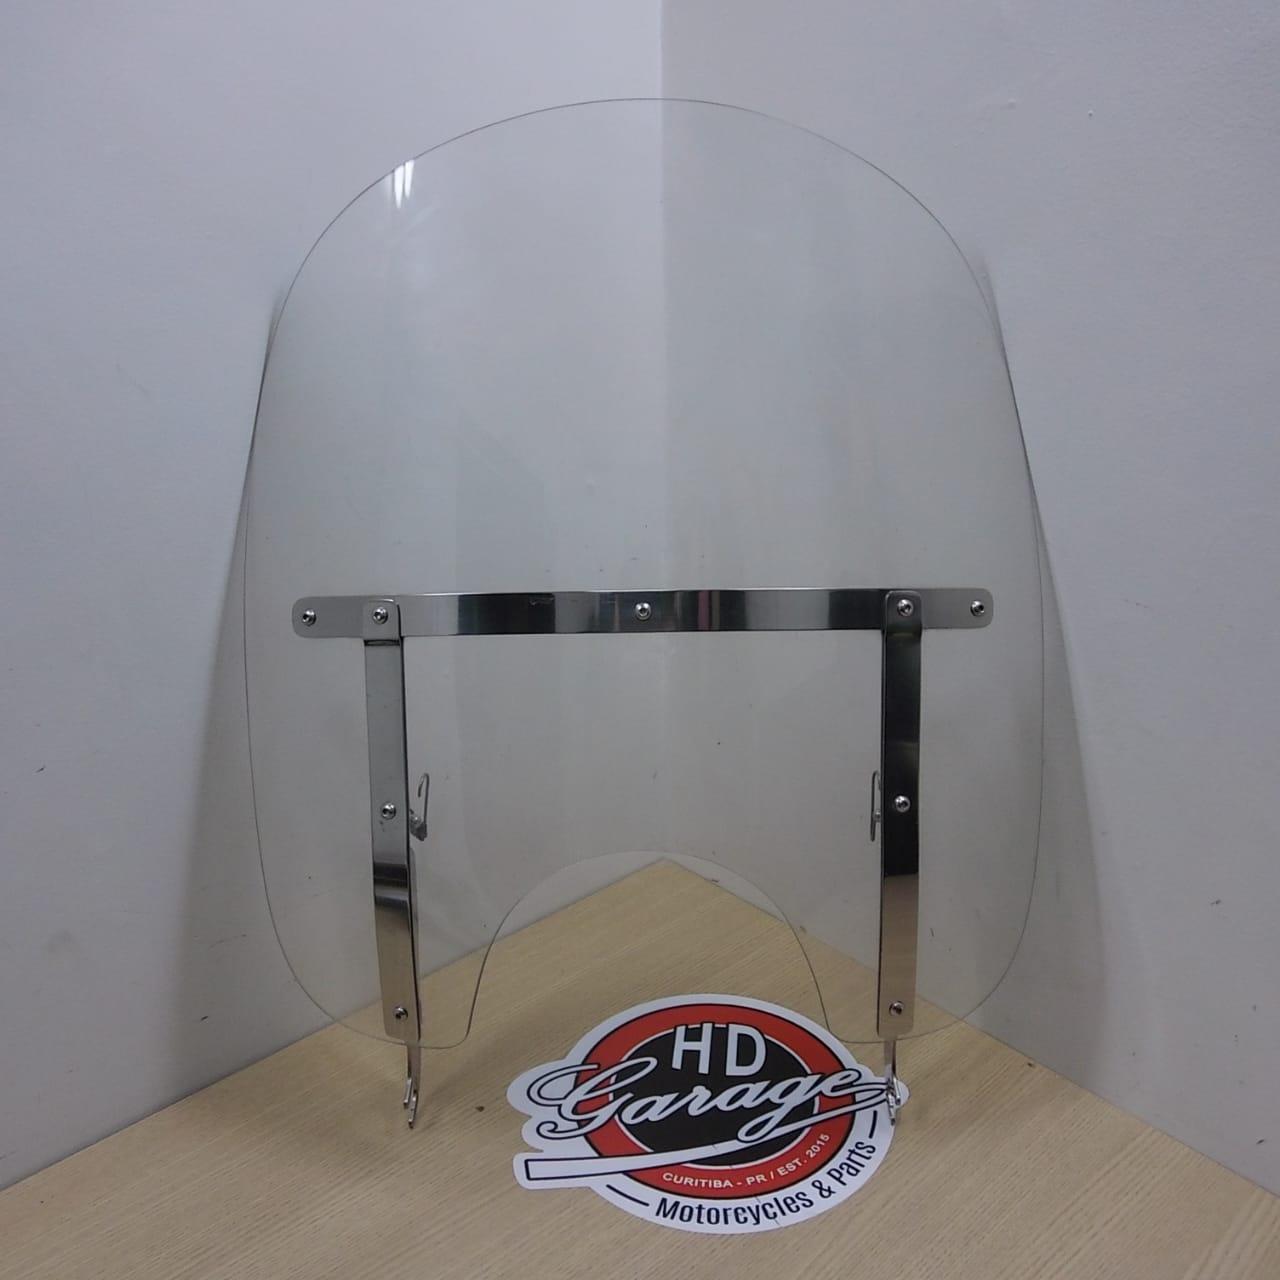 Parabrisa Policarbonato Cristal - Perfil Alto - HD Softail 2000 até 2017 - Destacável - 011/03807